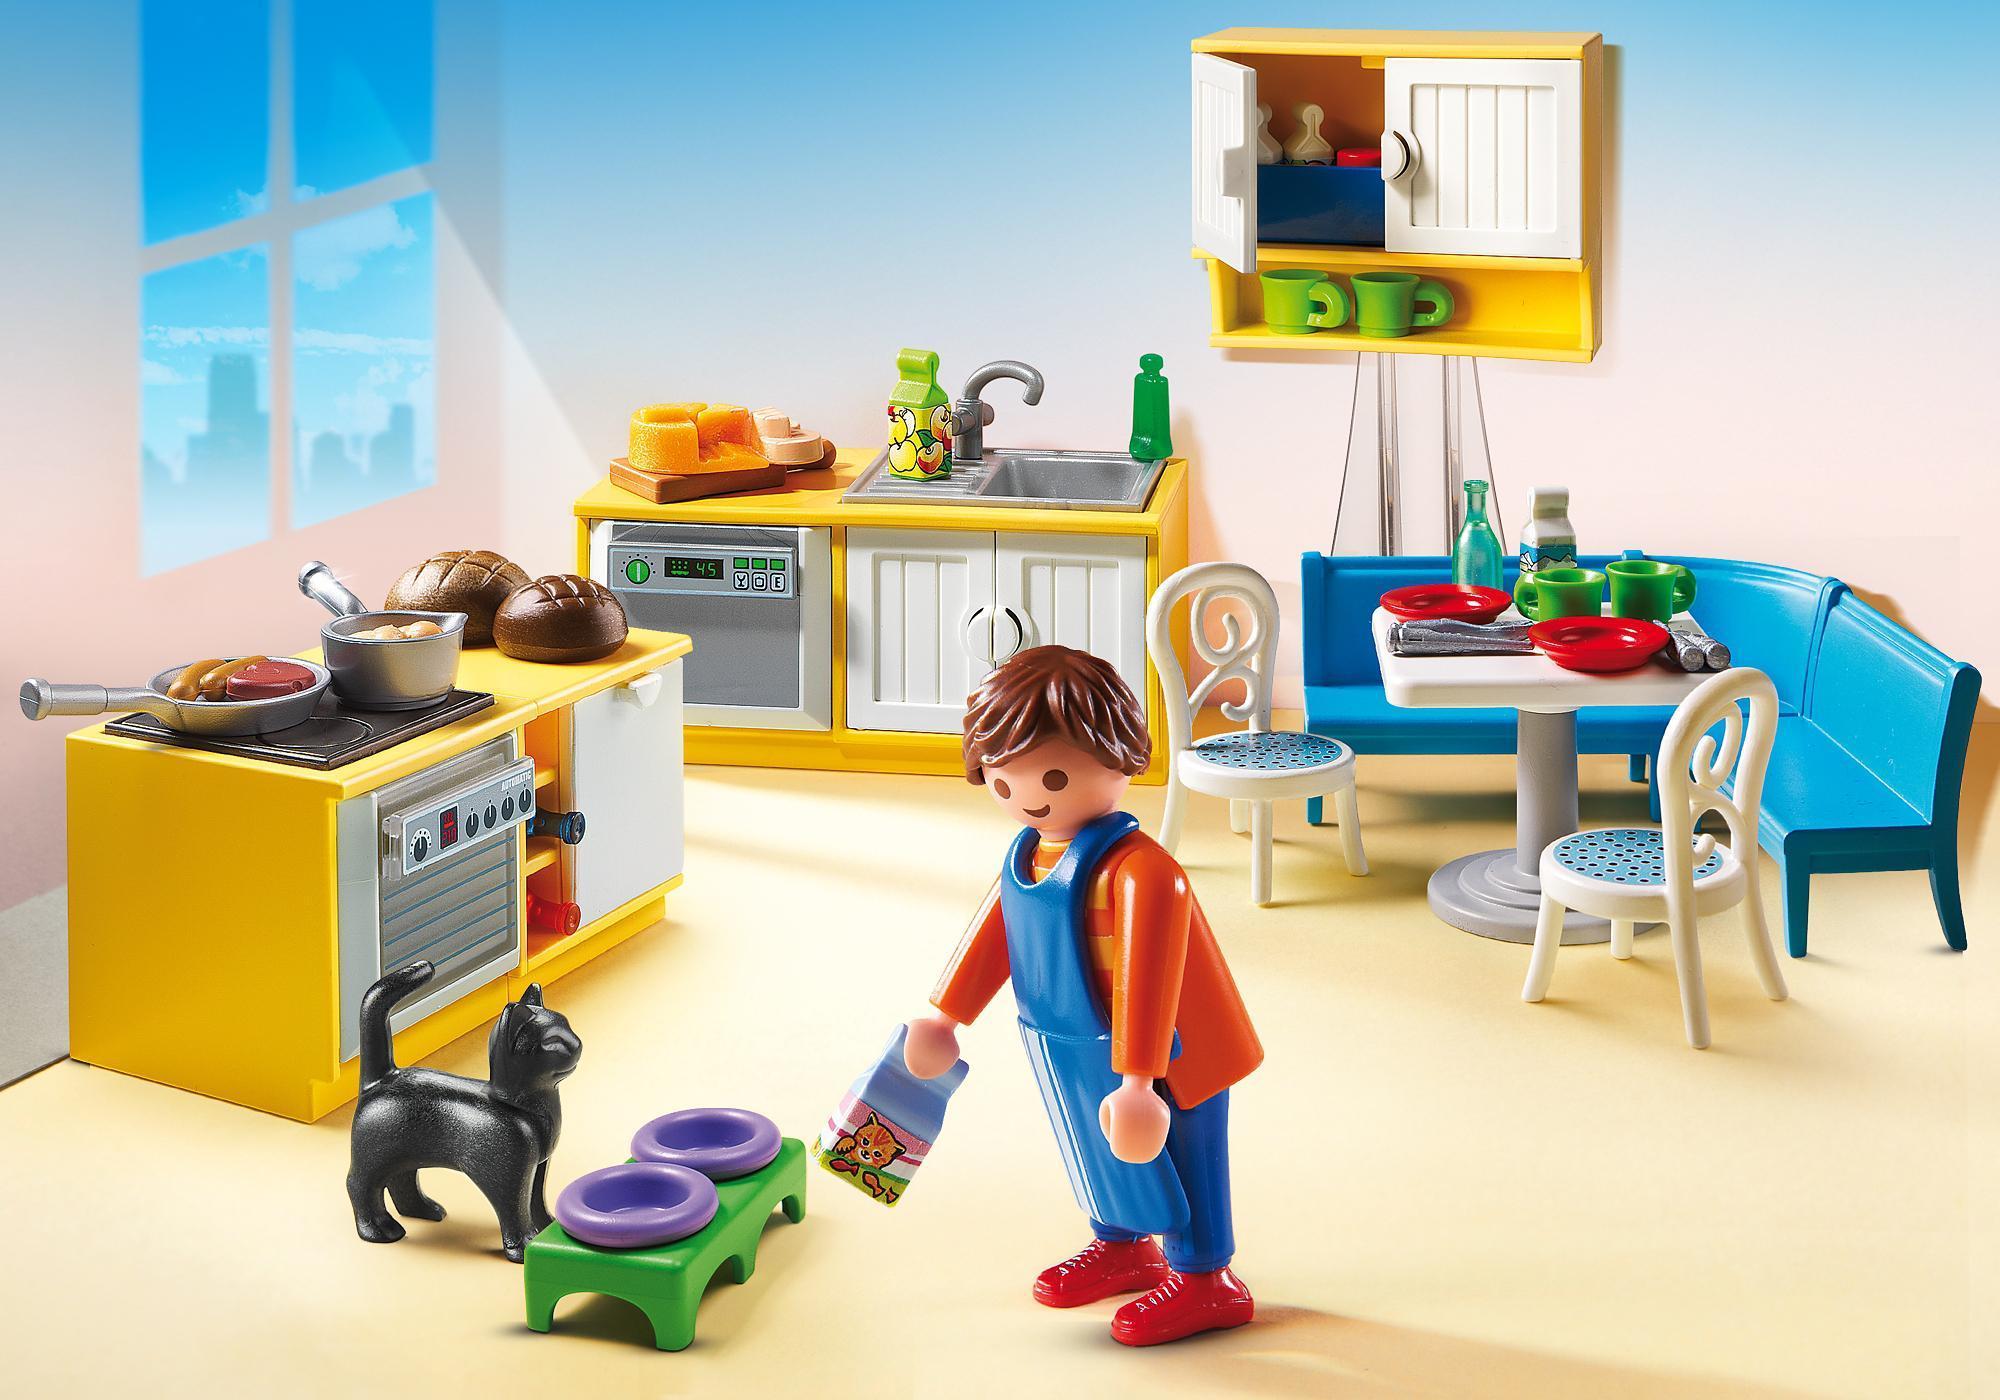 http://media.playmobil.com/i/playmobil/5336_product_detail/Cocina